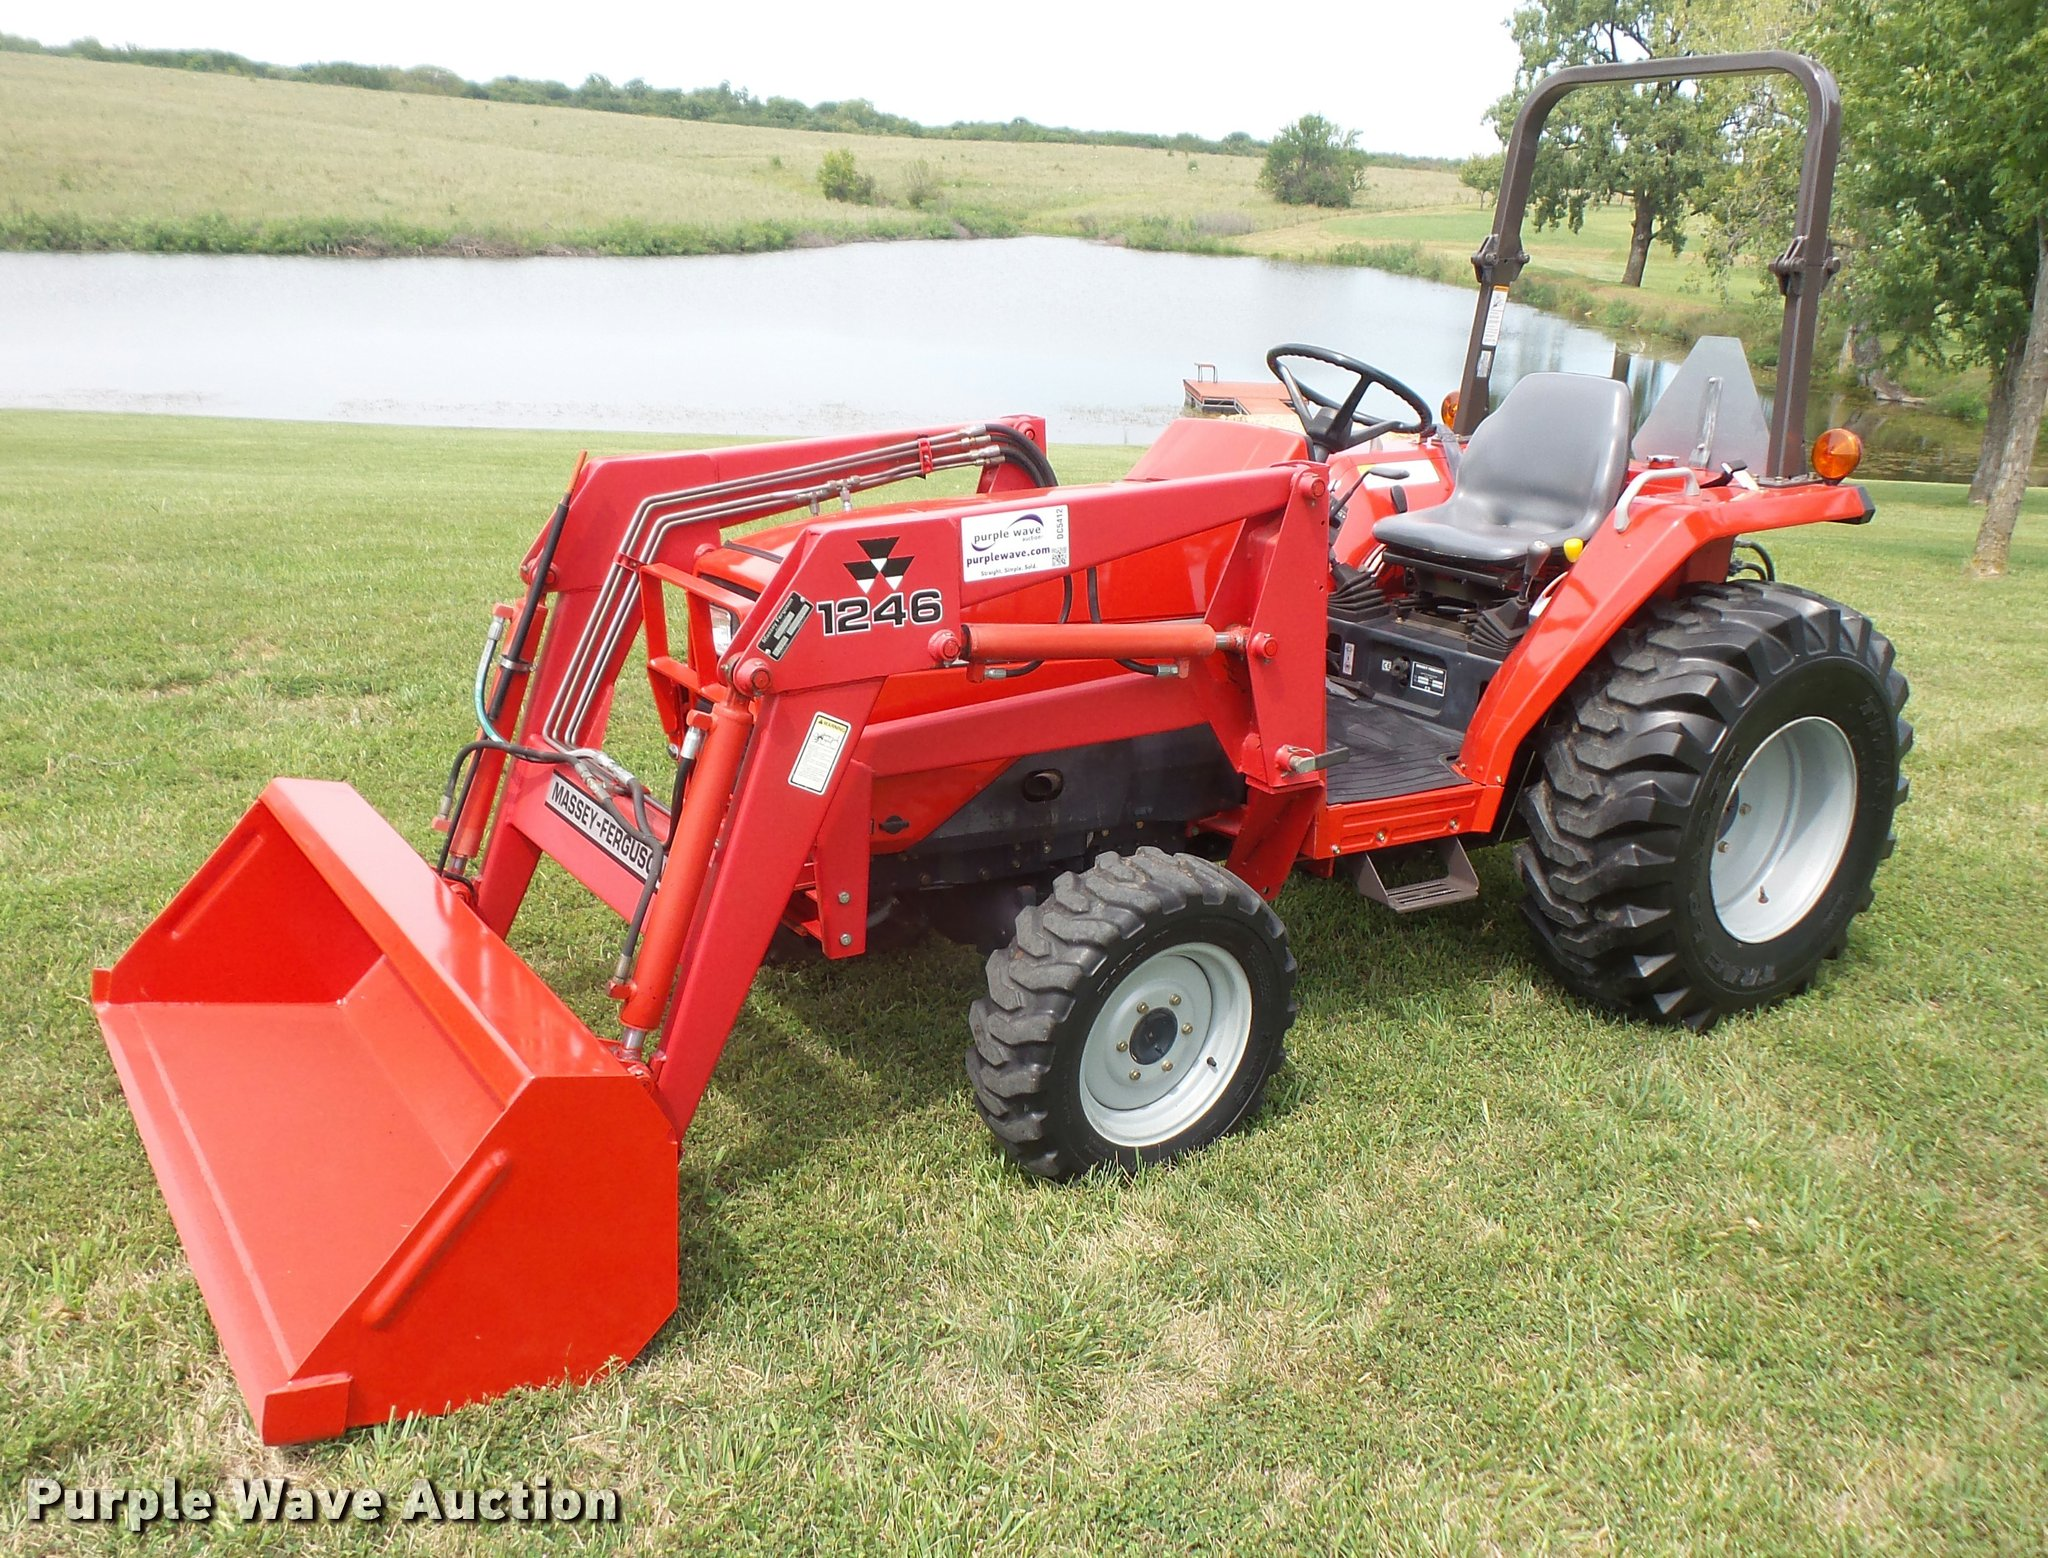 2000 massey ferguson 1240 mfwd tractor item dc5412 sold rh purplewave com Massey Ferguson 200 Loader Front Massey Ferguson 200 Loader Front